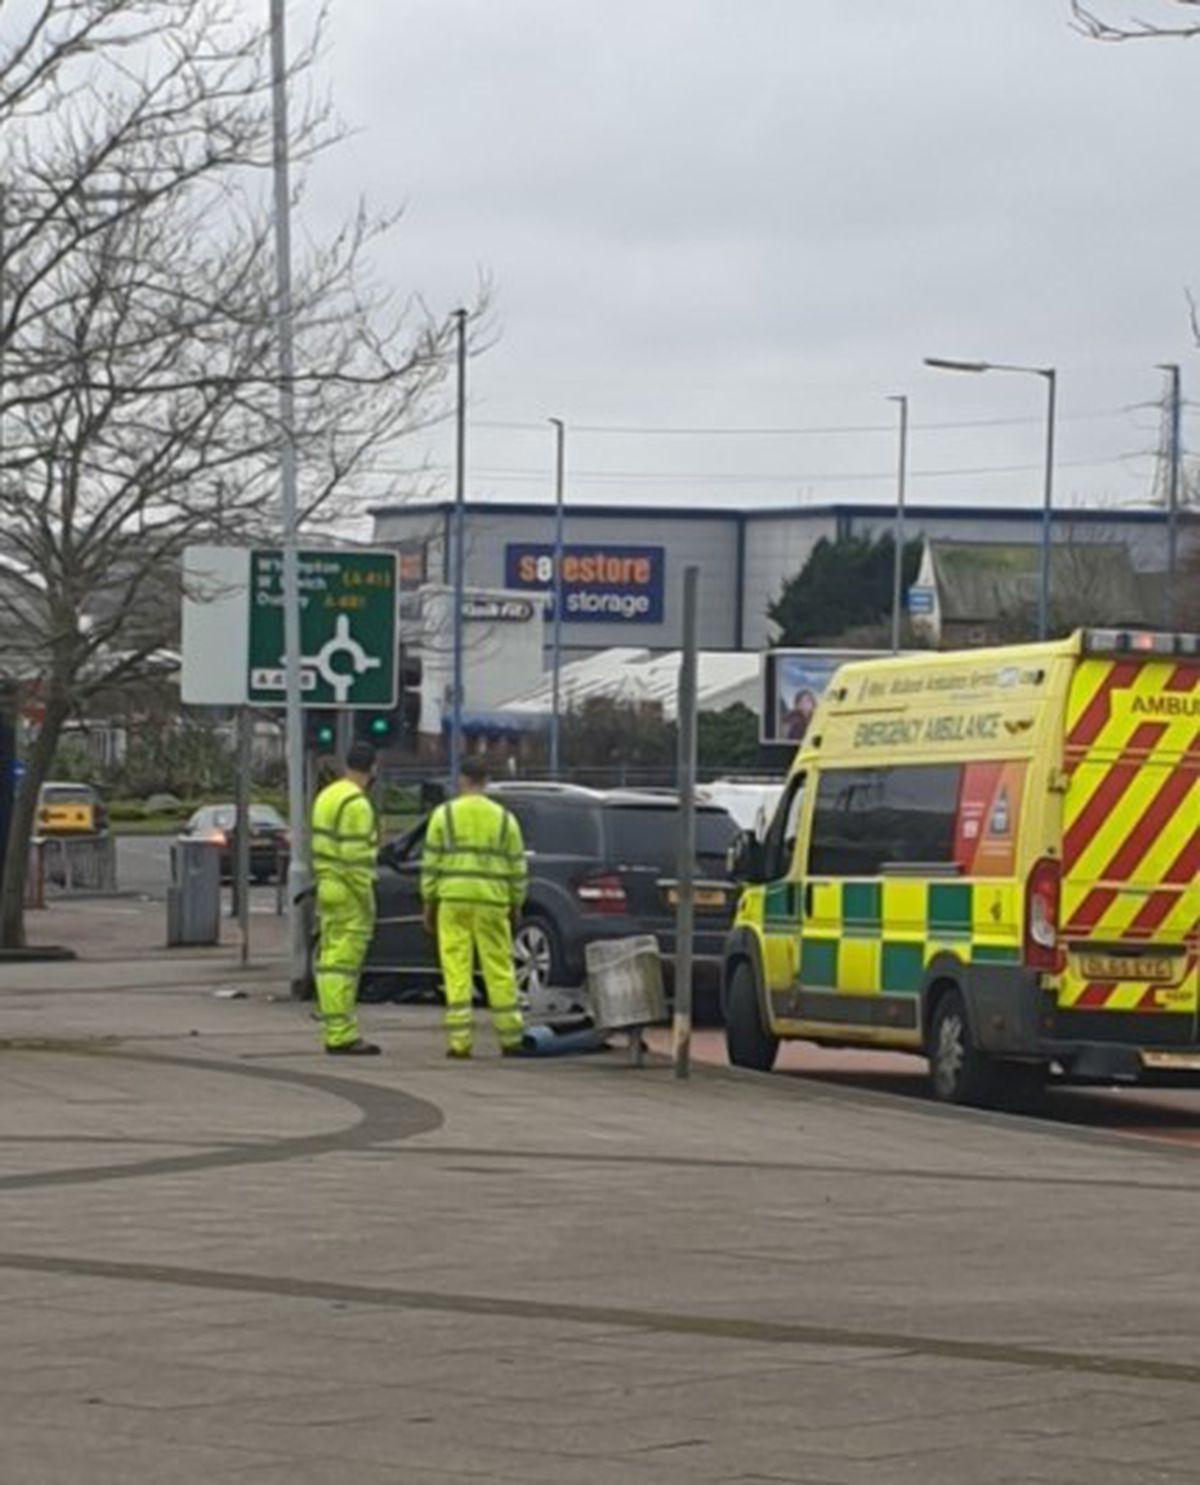 The crash in Wednesbury. Photo: David Wilkes